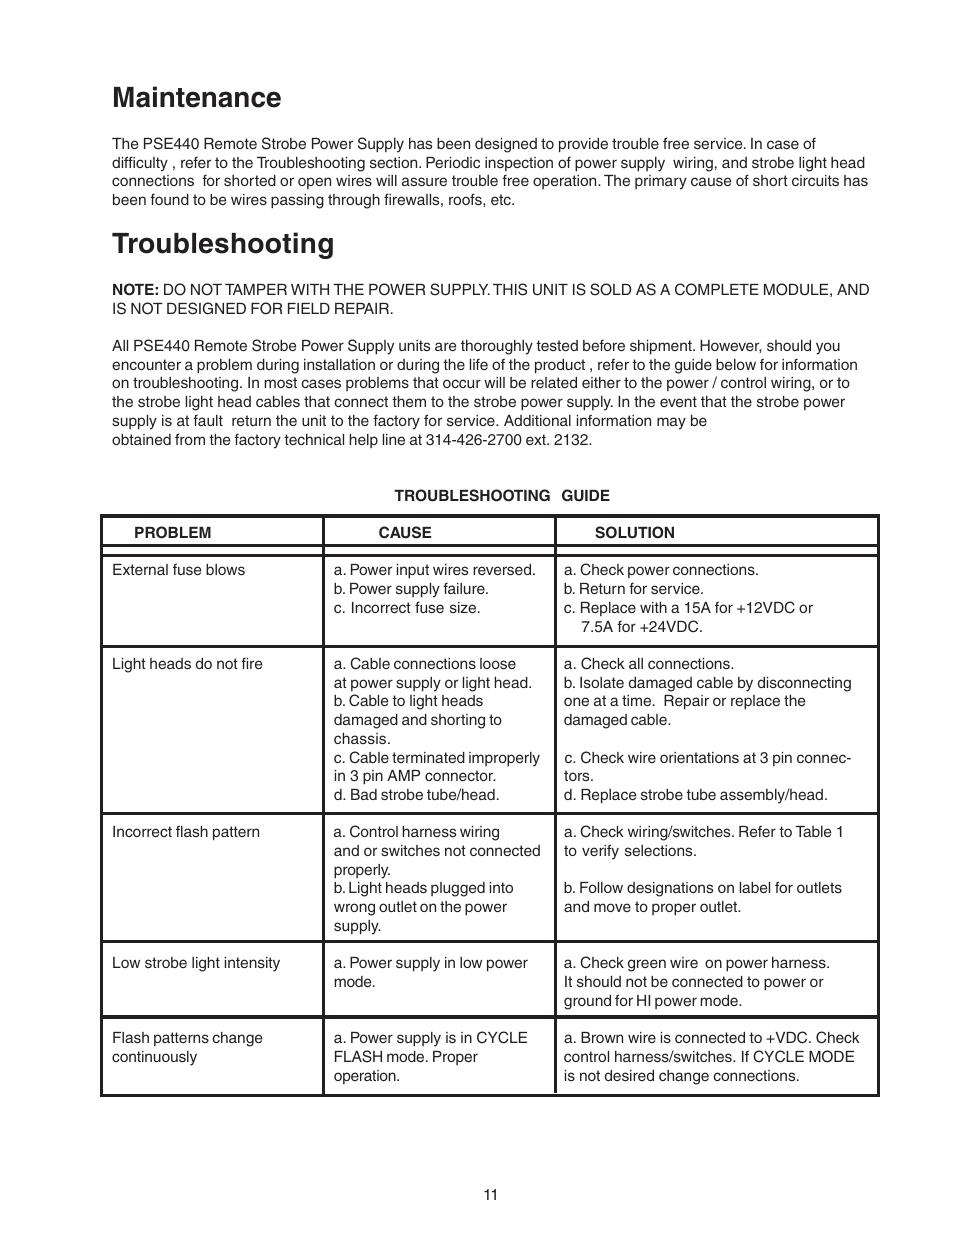 Maintenance, Troubleshooting | Code 3 PSE440 Remote Strobe